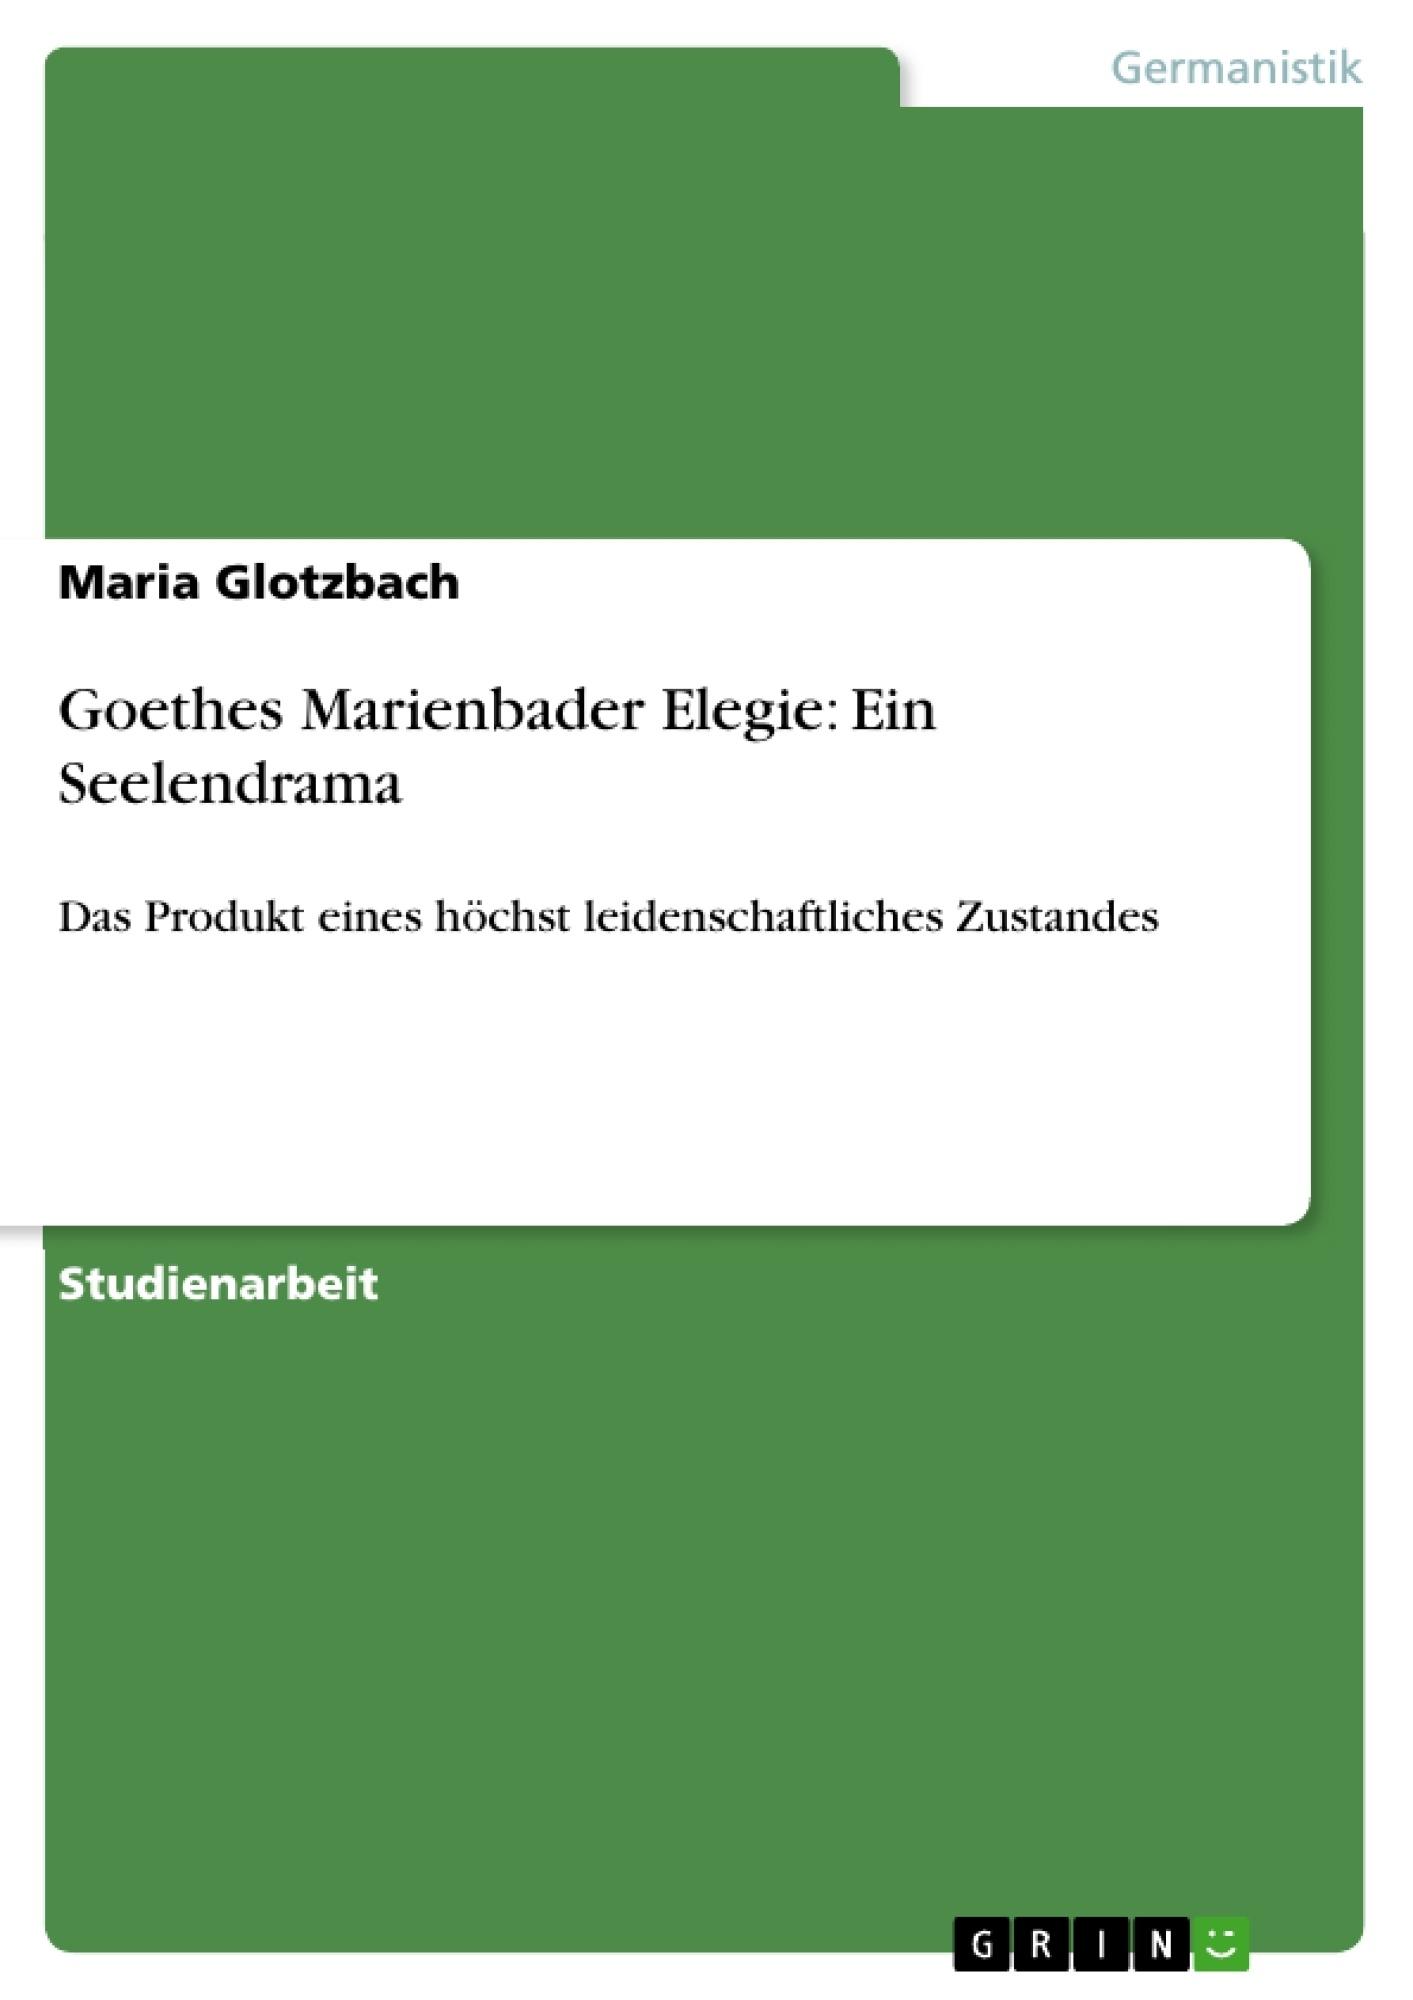 Titel: Goethes Marienbader Elegie: Ein Seelendrama